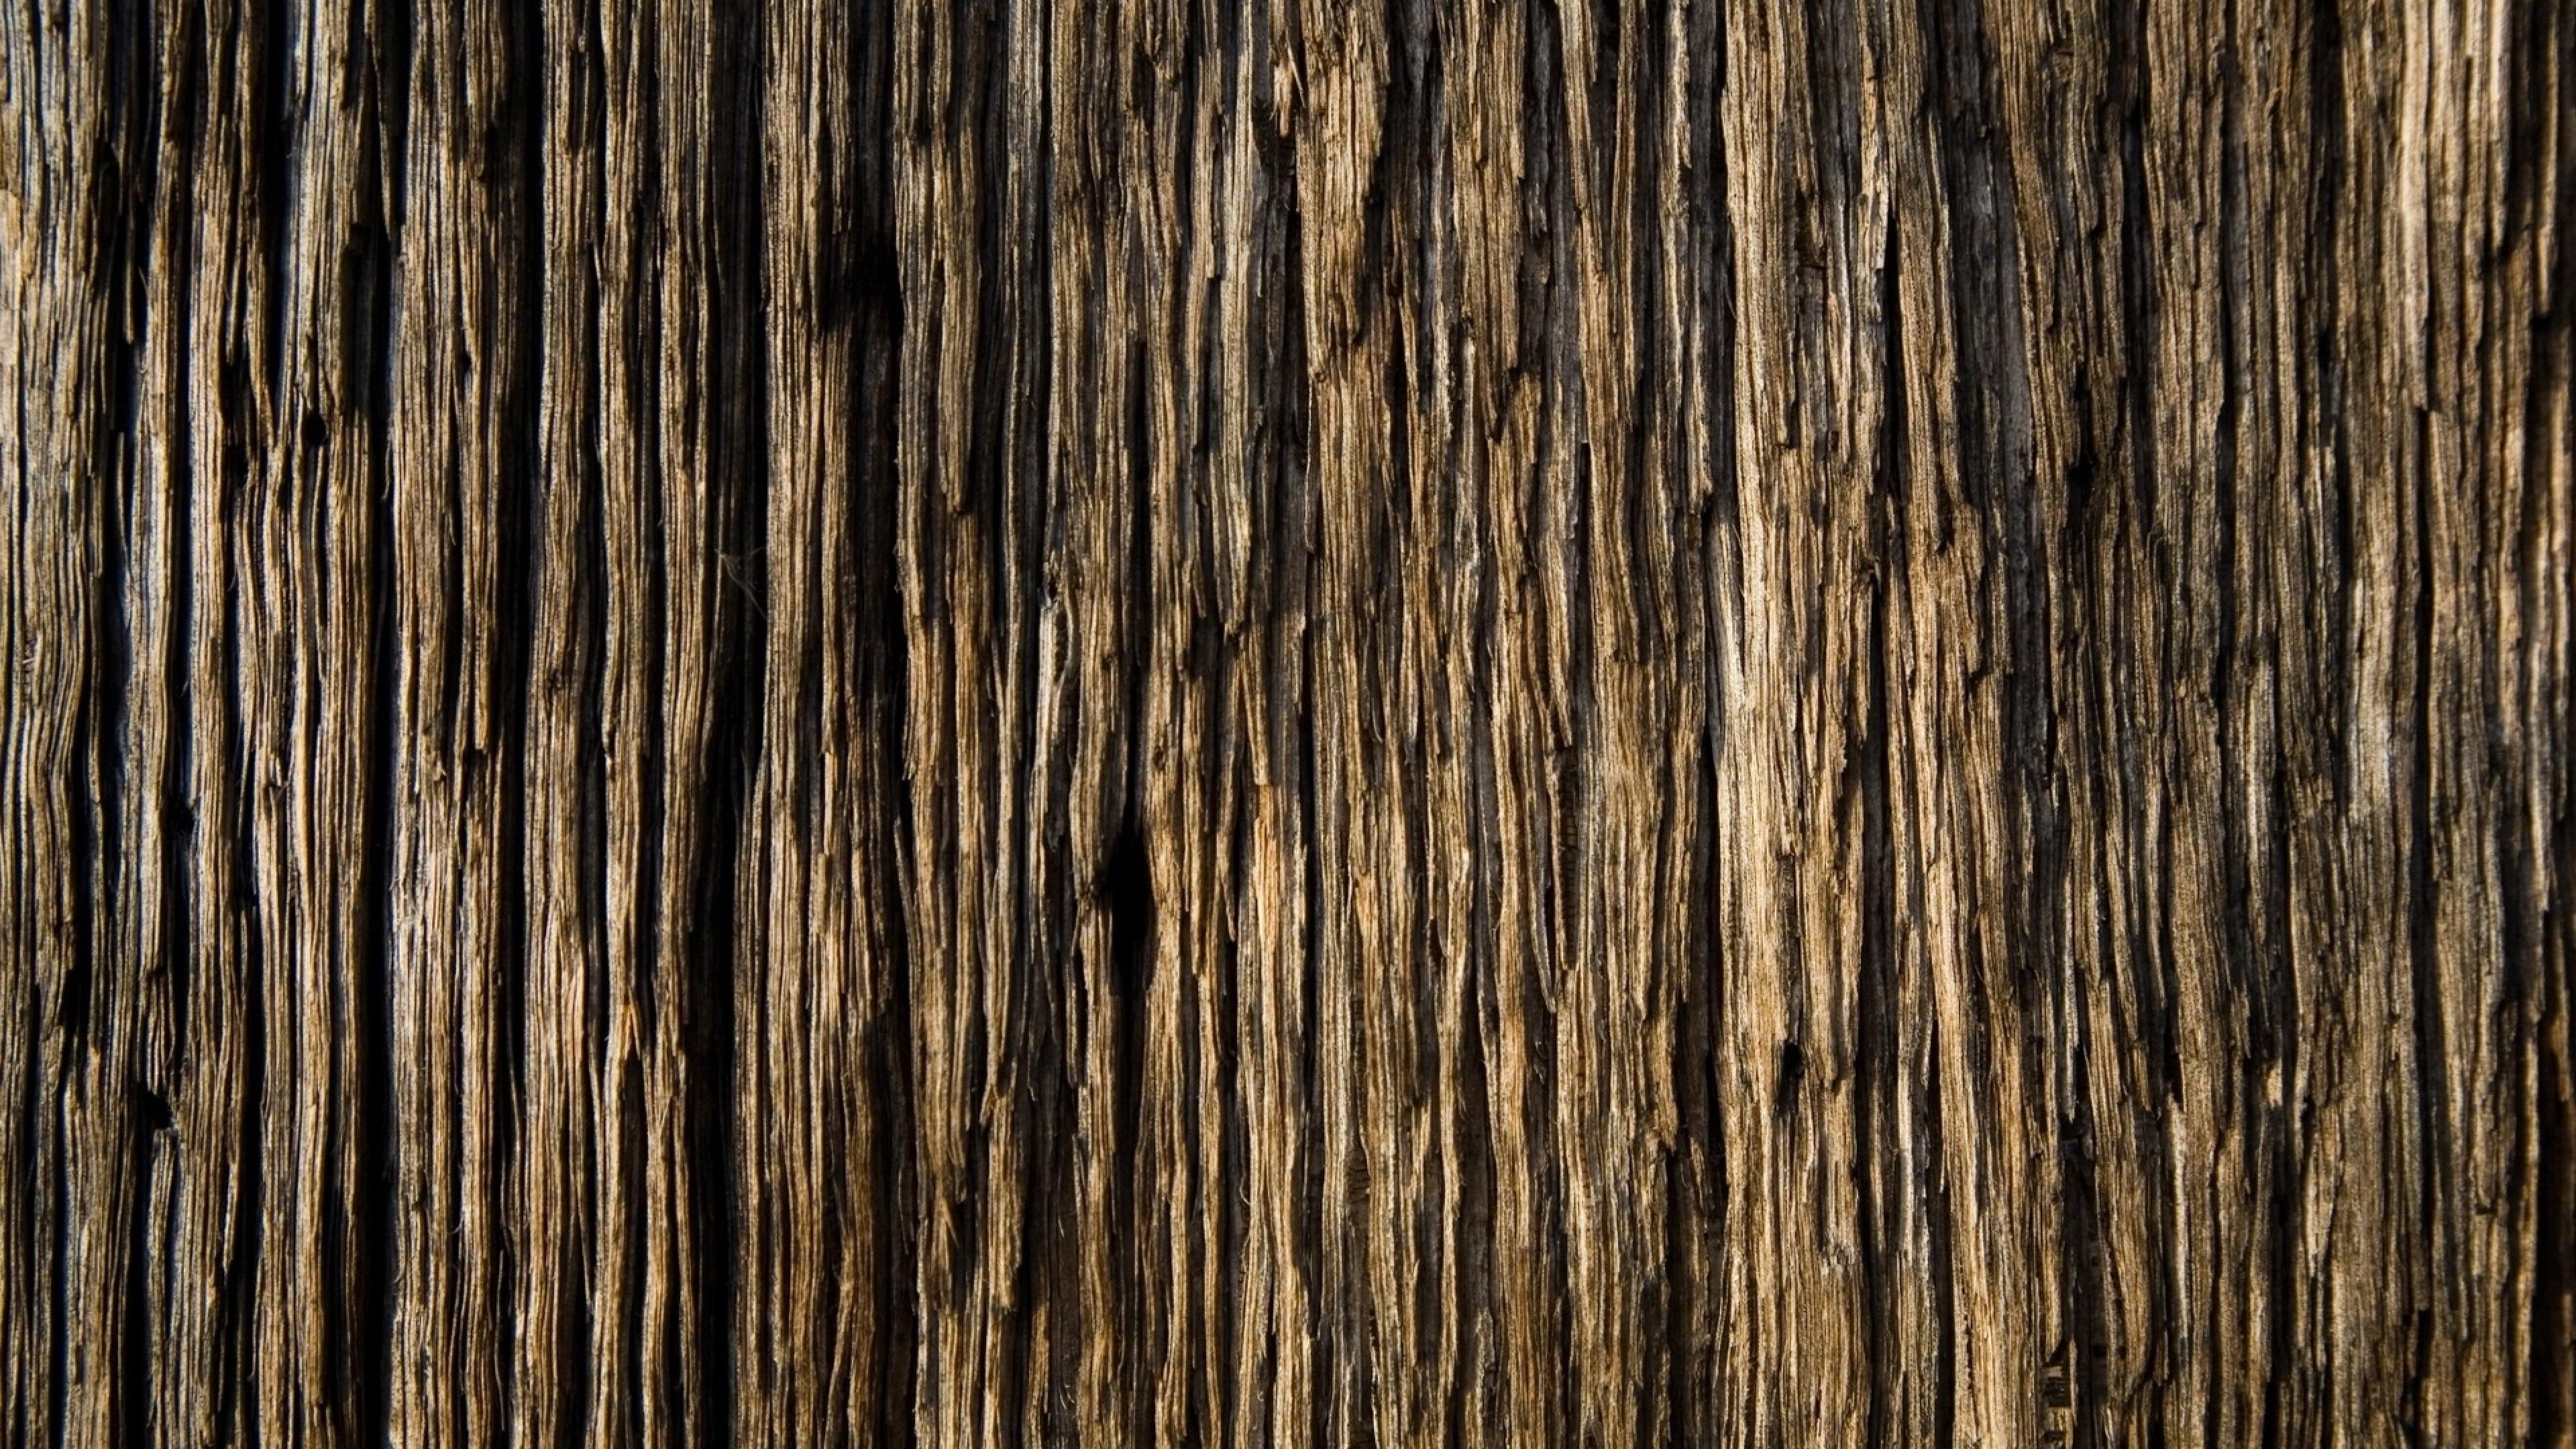 17 Fantastic HD Tree Bark Wallpapers